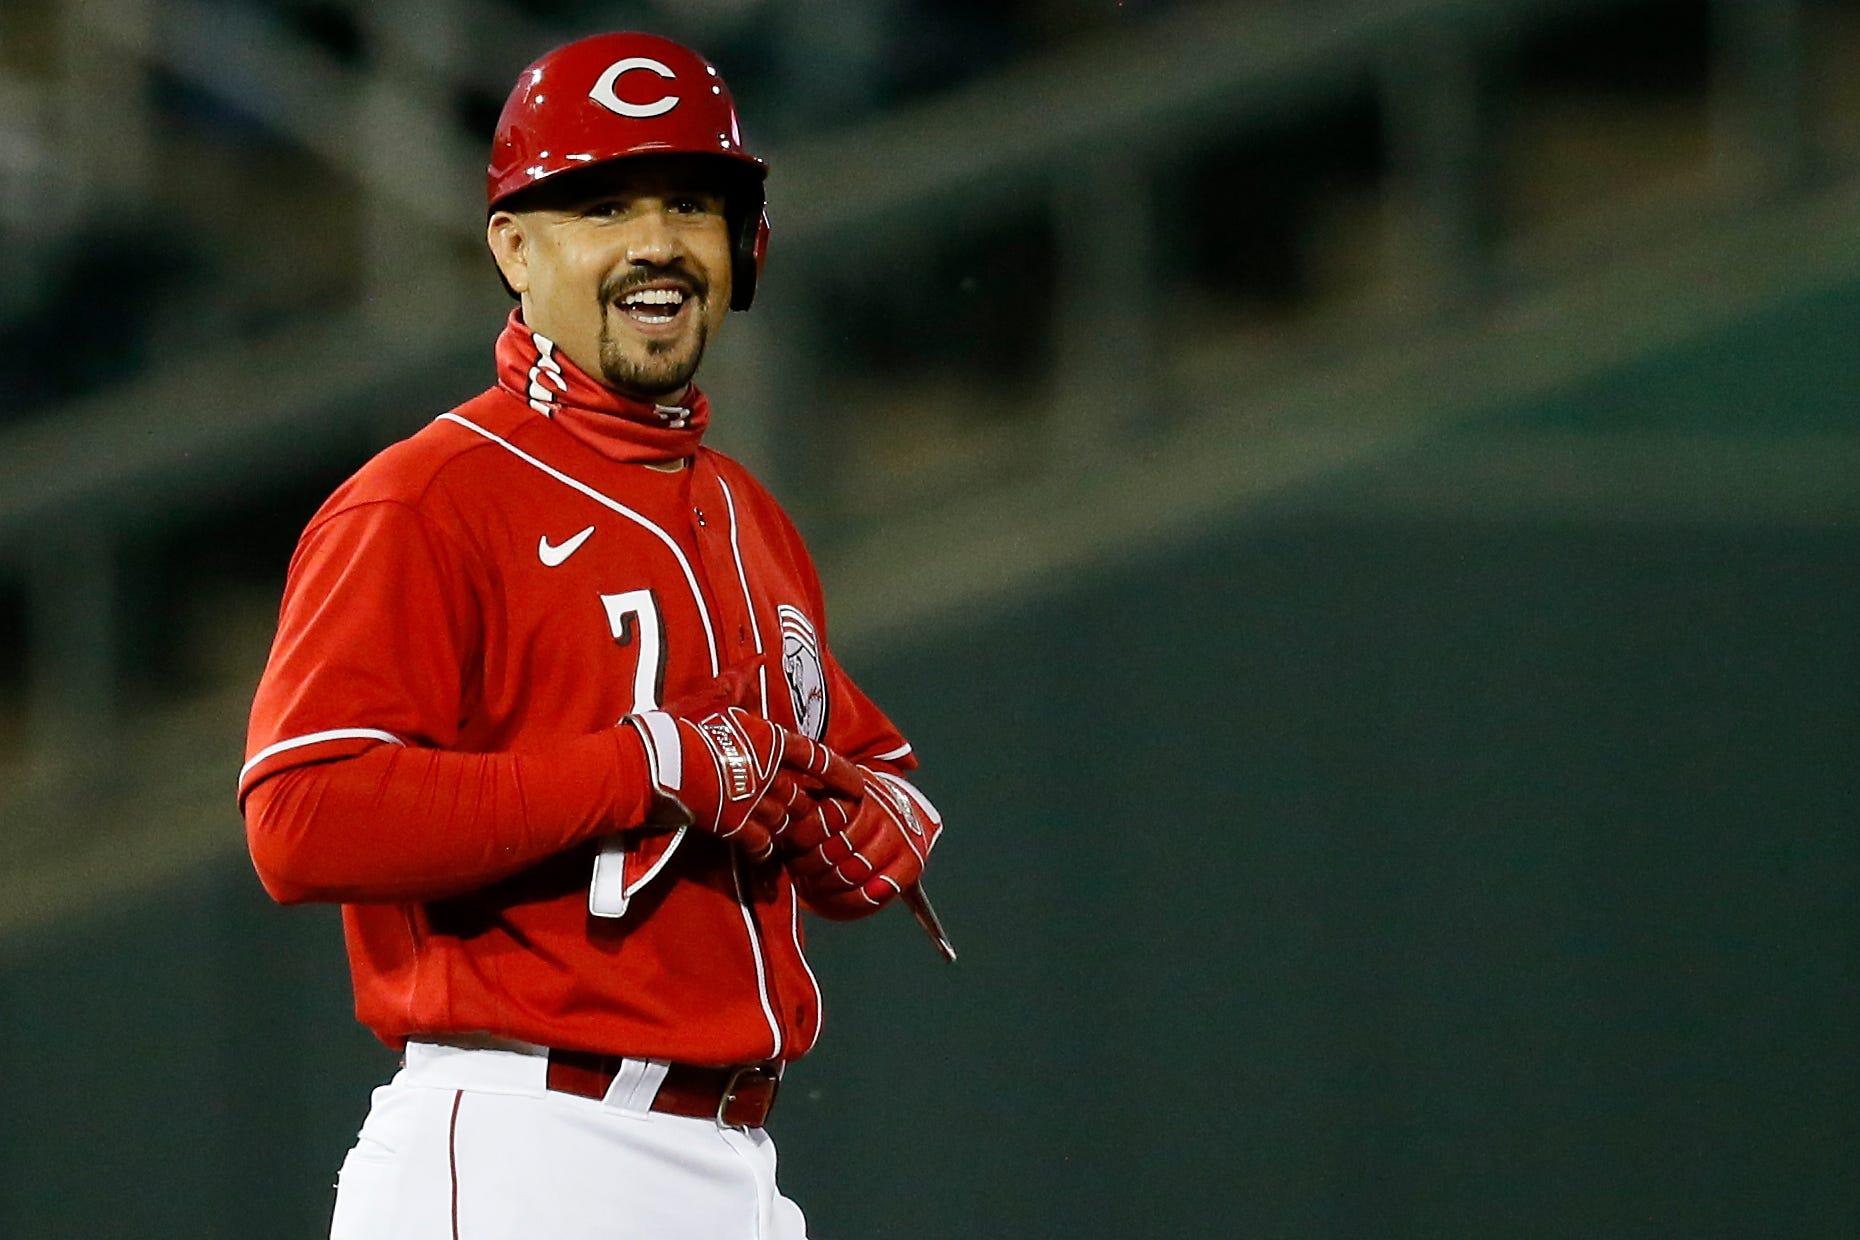 Cincinnati Reds roster: Eugenio Suarez thrilled to return to shortstop